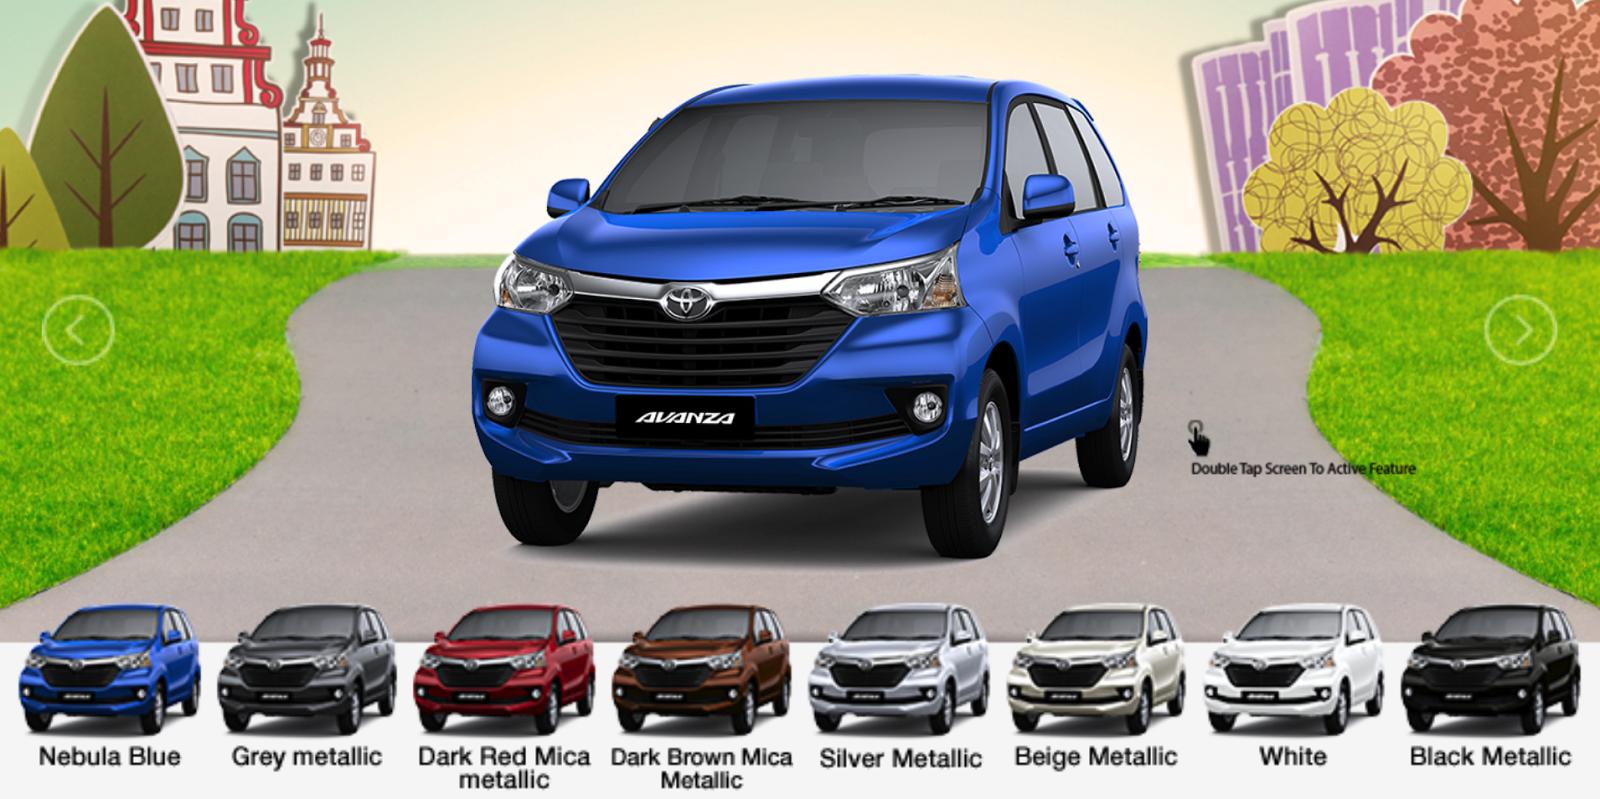 Harga Grand New Avanza Veloz 2018 Agya Trd Hitam Spesifikasi And Mobil Toyota Baru Semarang